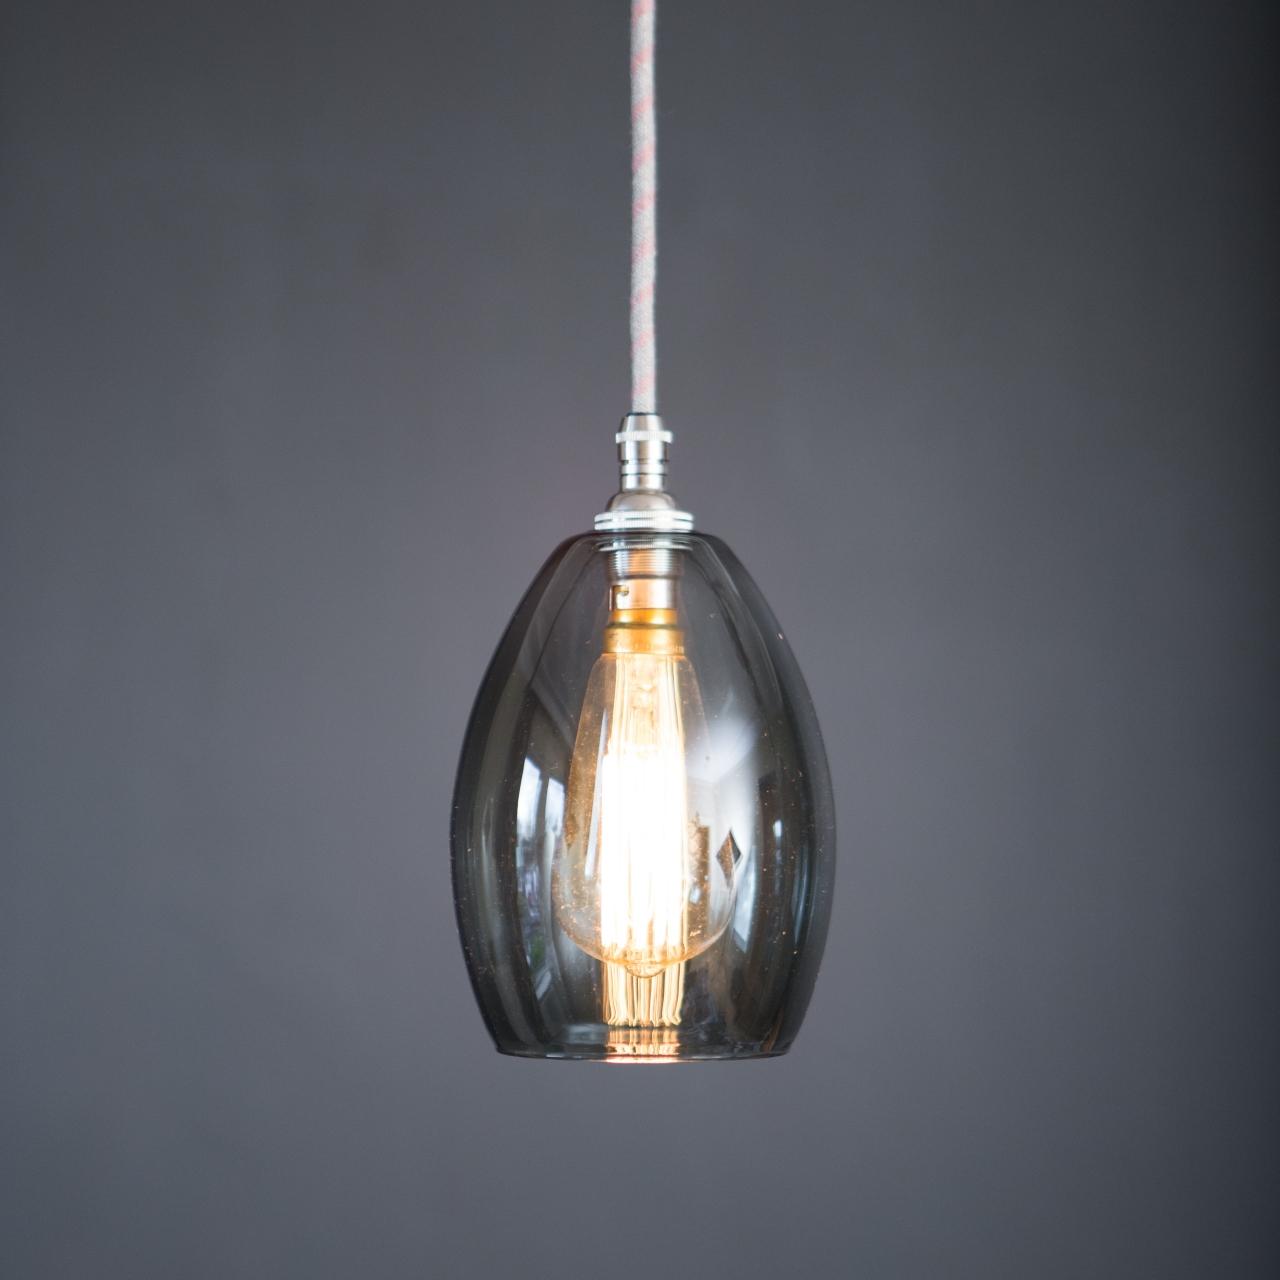 60da8b21f73 Bertie small Smoked glass pendant light - Glow Lighting